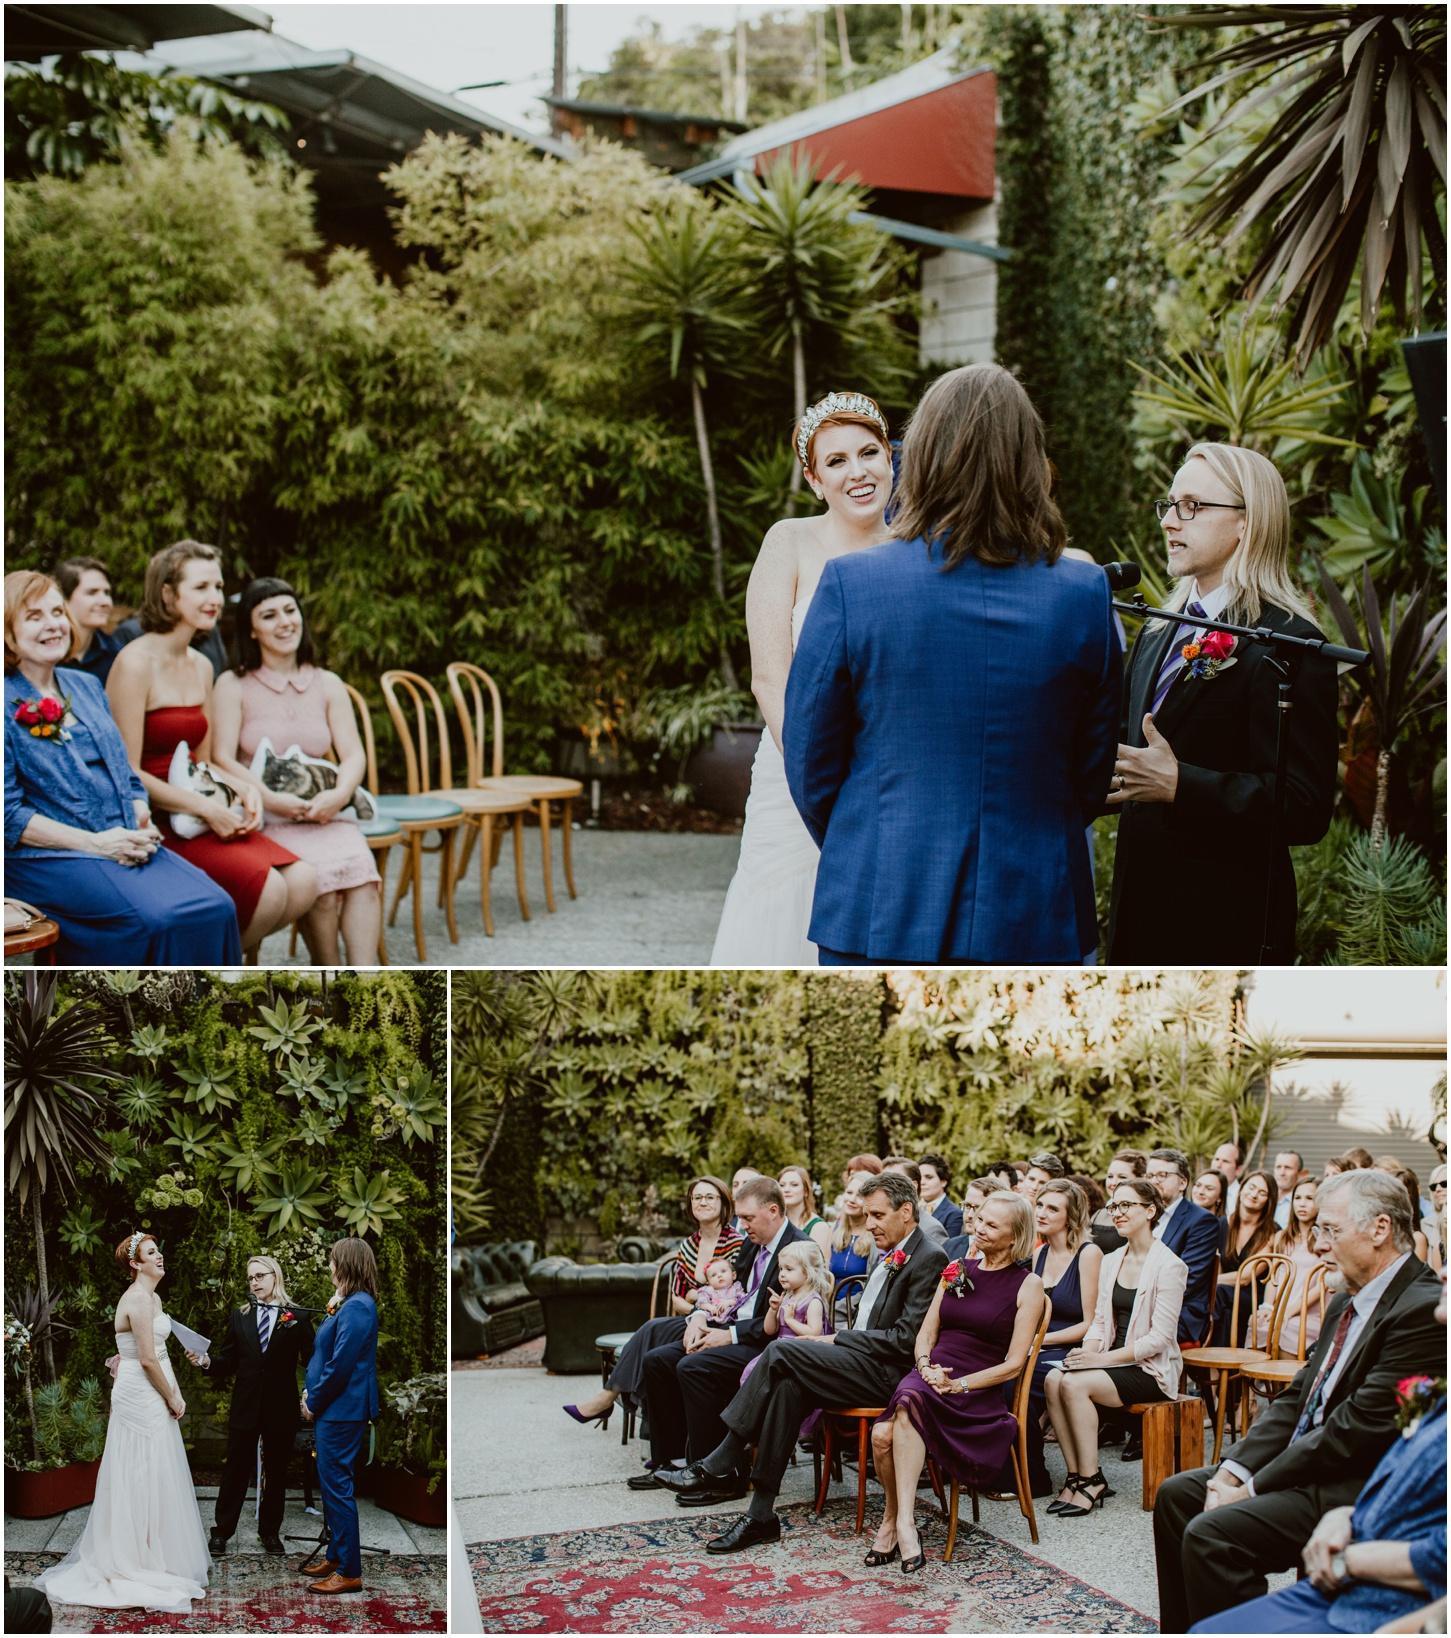 Smogshoppe-Wedding-S+C-Diana-Lake-Photography-419.jpg